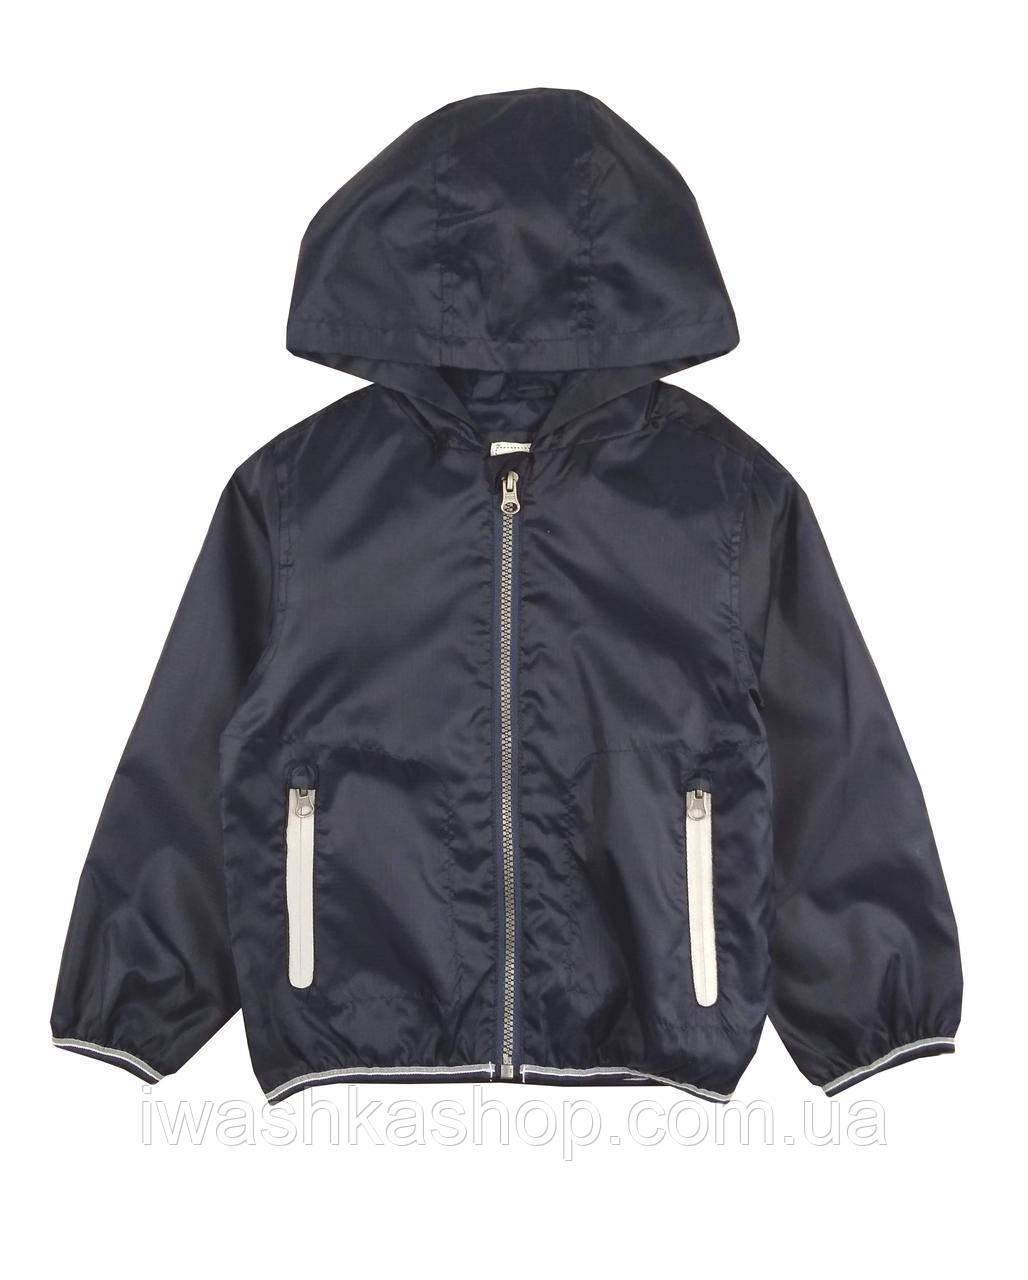 Темно-синяя куртка, ветровка на мальчика 3 - 4 лет, р. 104, Rebel by Primark